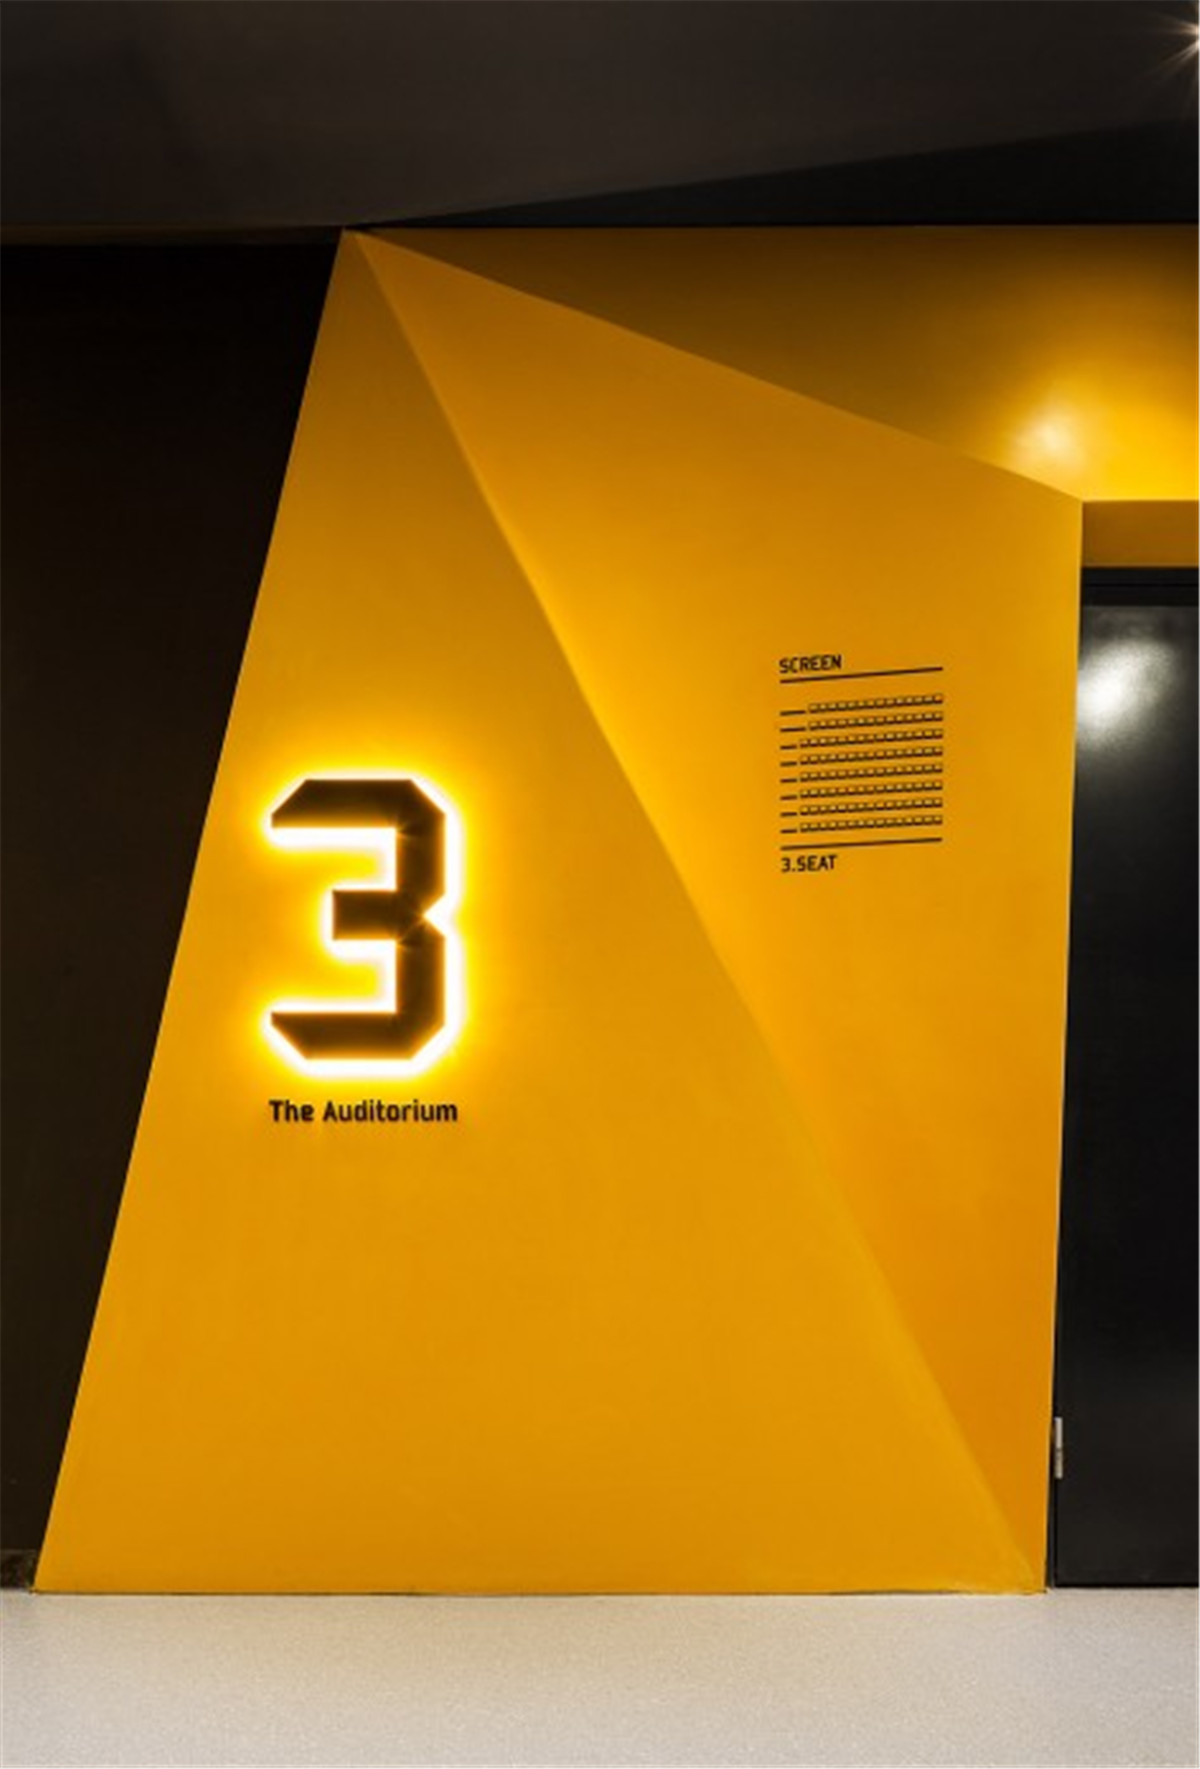 014-Cinema-of-Vitality-in-Yellow-Origami-Baichuan-International-Cinema-By-UM-DESIGN-472x696